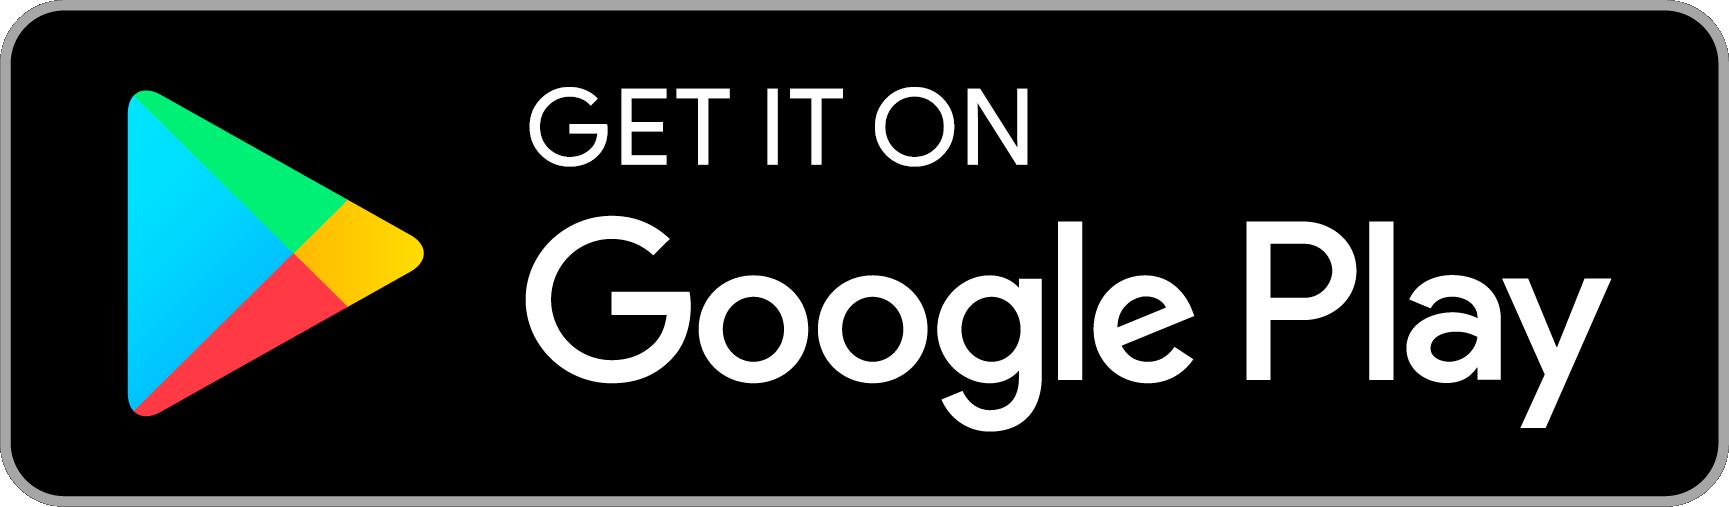 Google Play-01